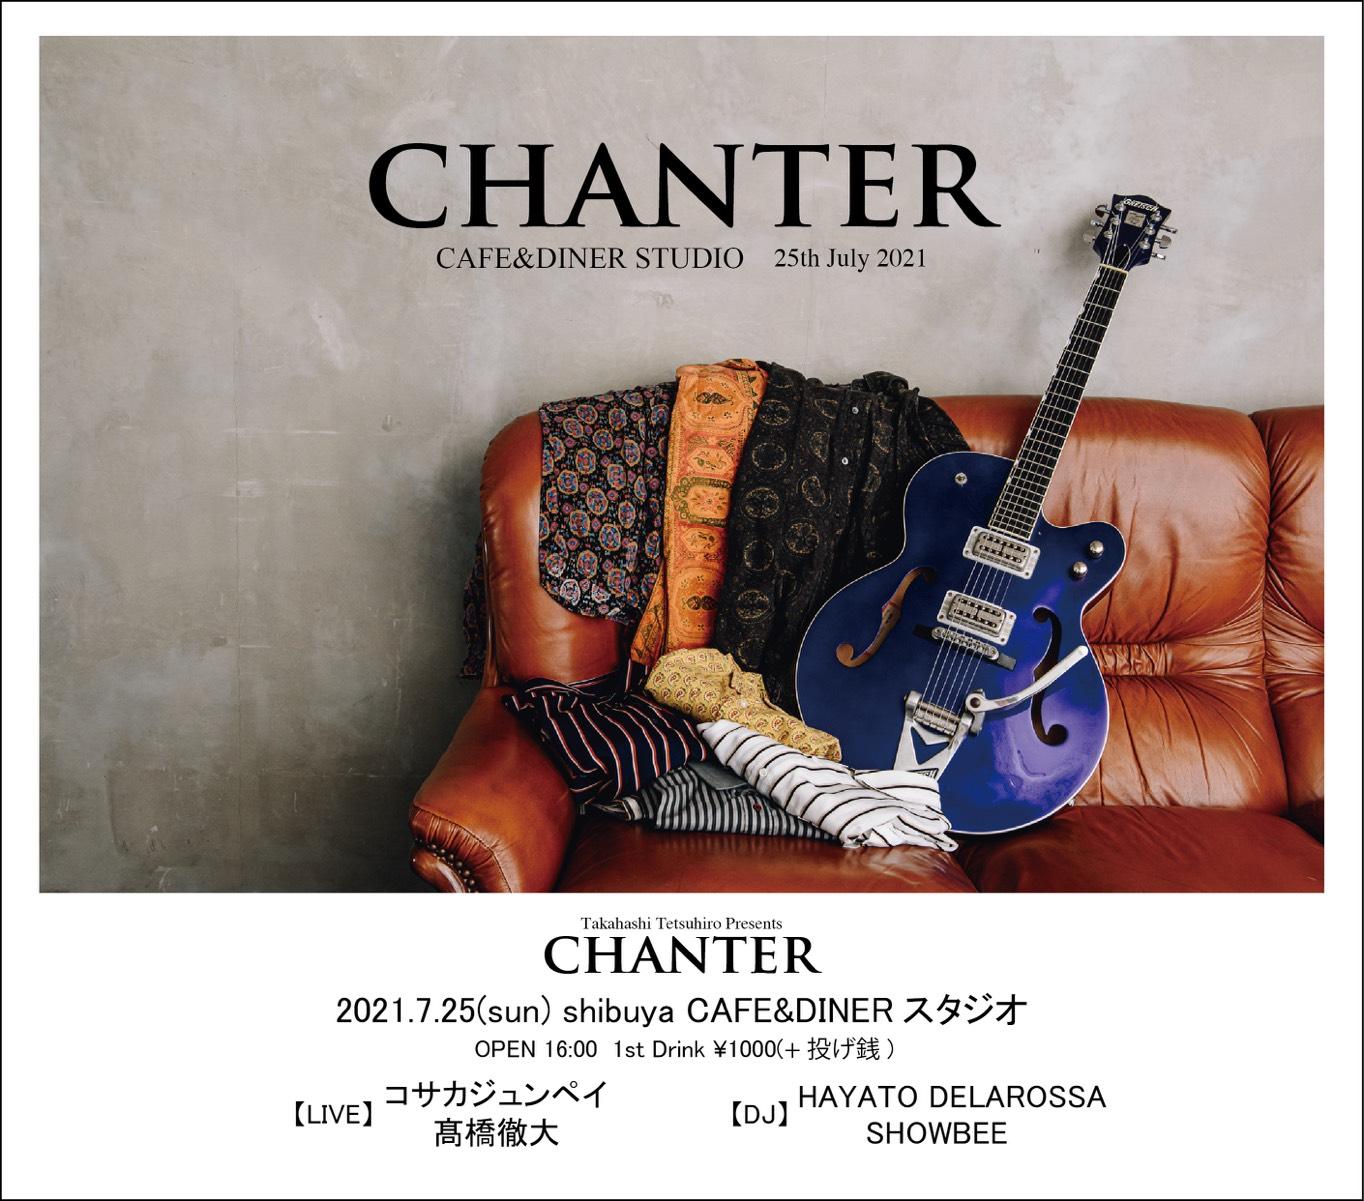 2021.7.25(sun)渋谷 CAFE&DINERスタジオ  「CHANTER」